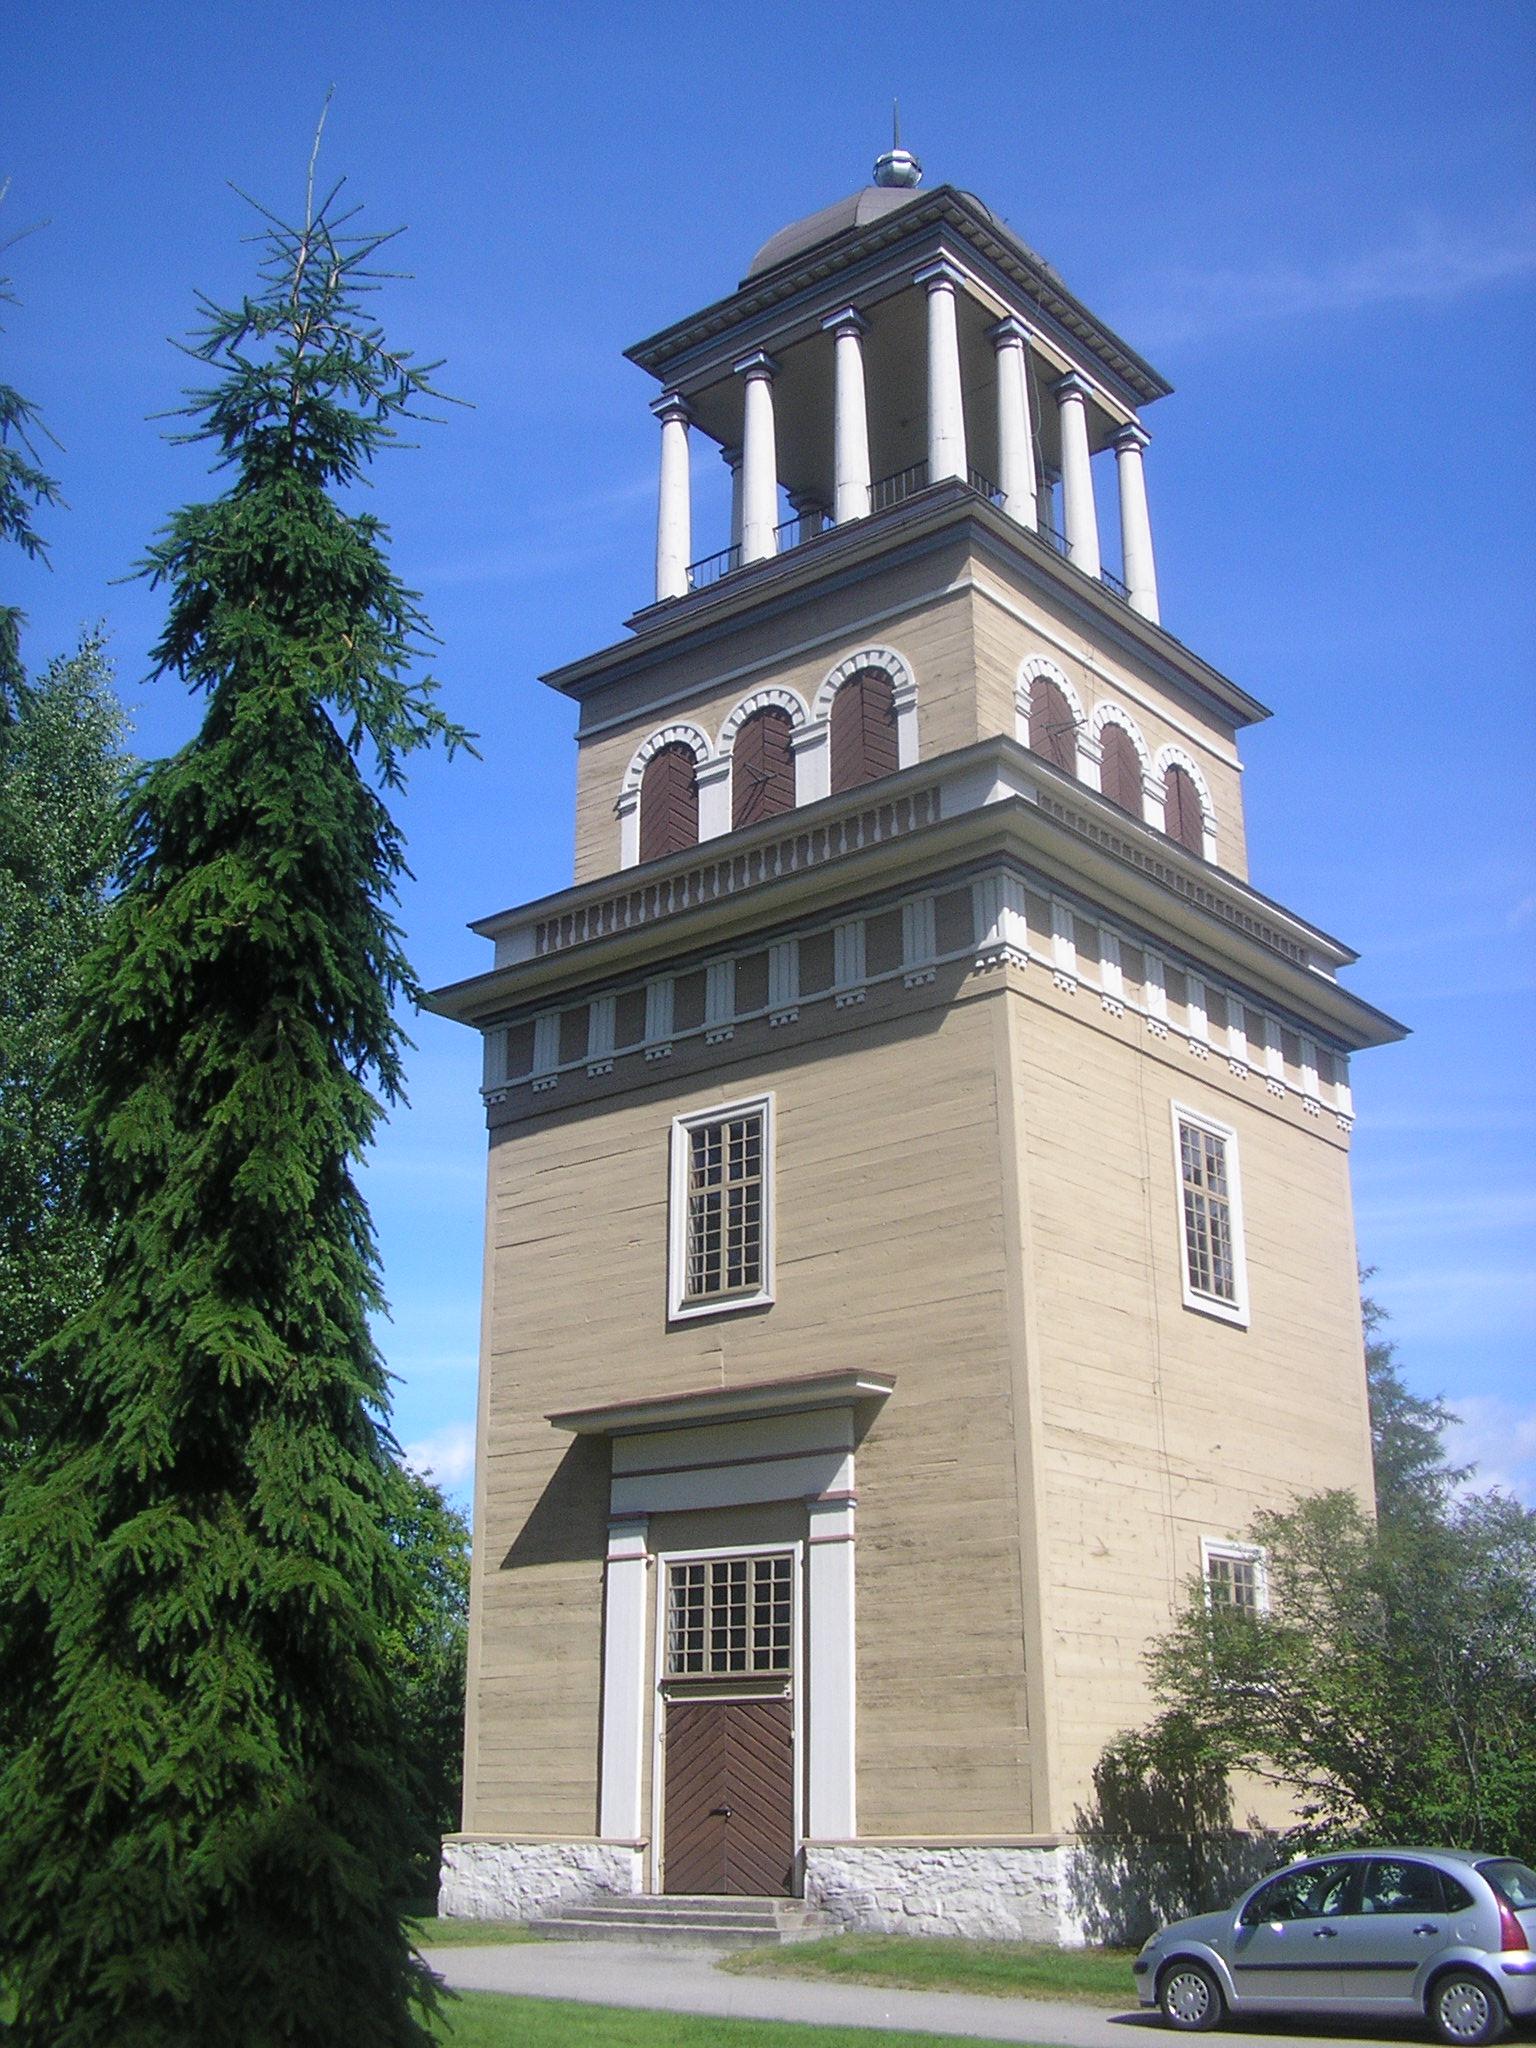 https://upload.wikimedia.org/wikipedia/commons/a/a3/Lieksa_bell_tower.jpg